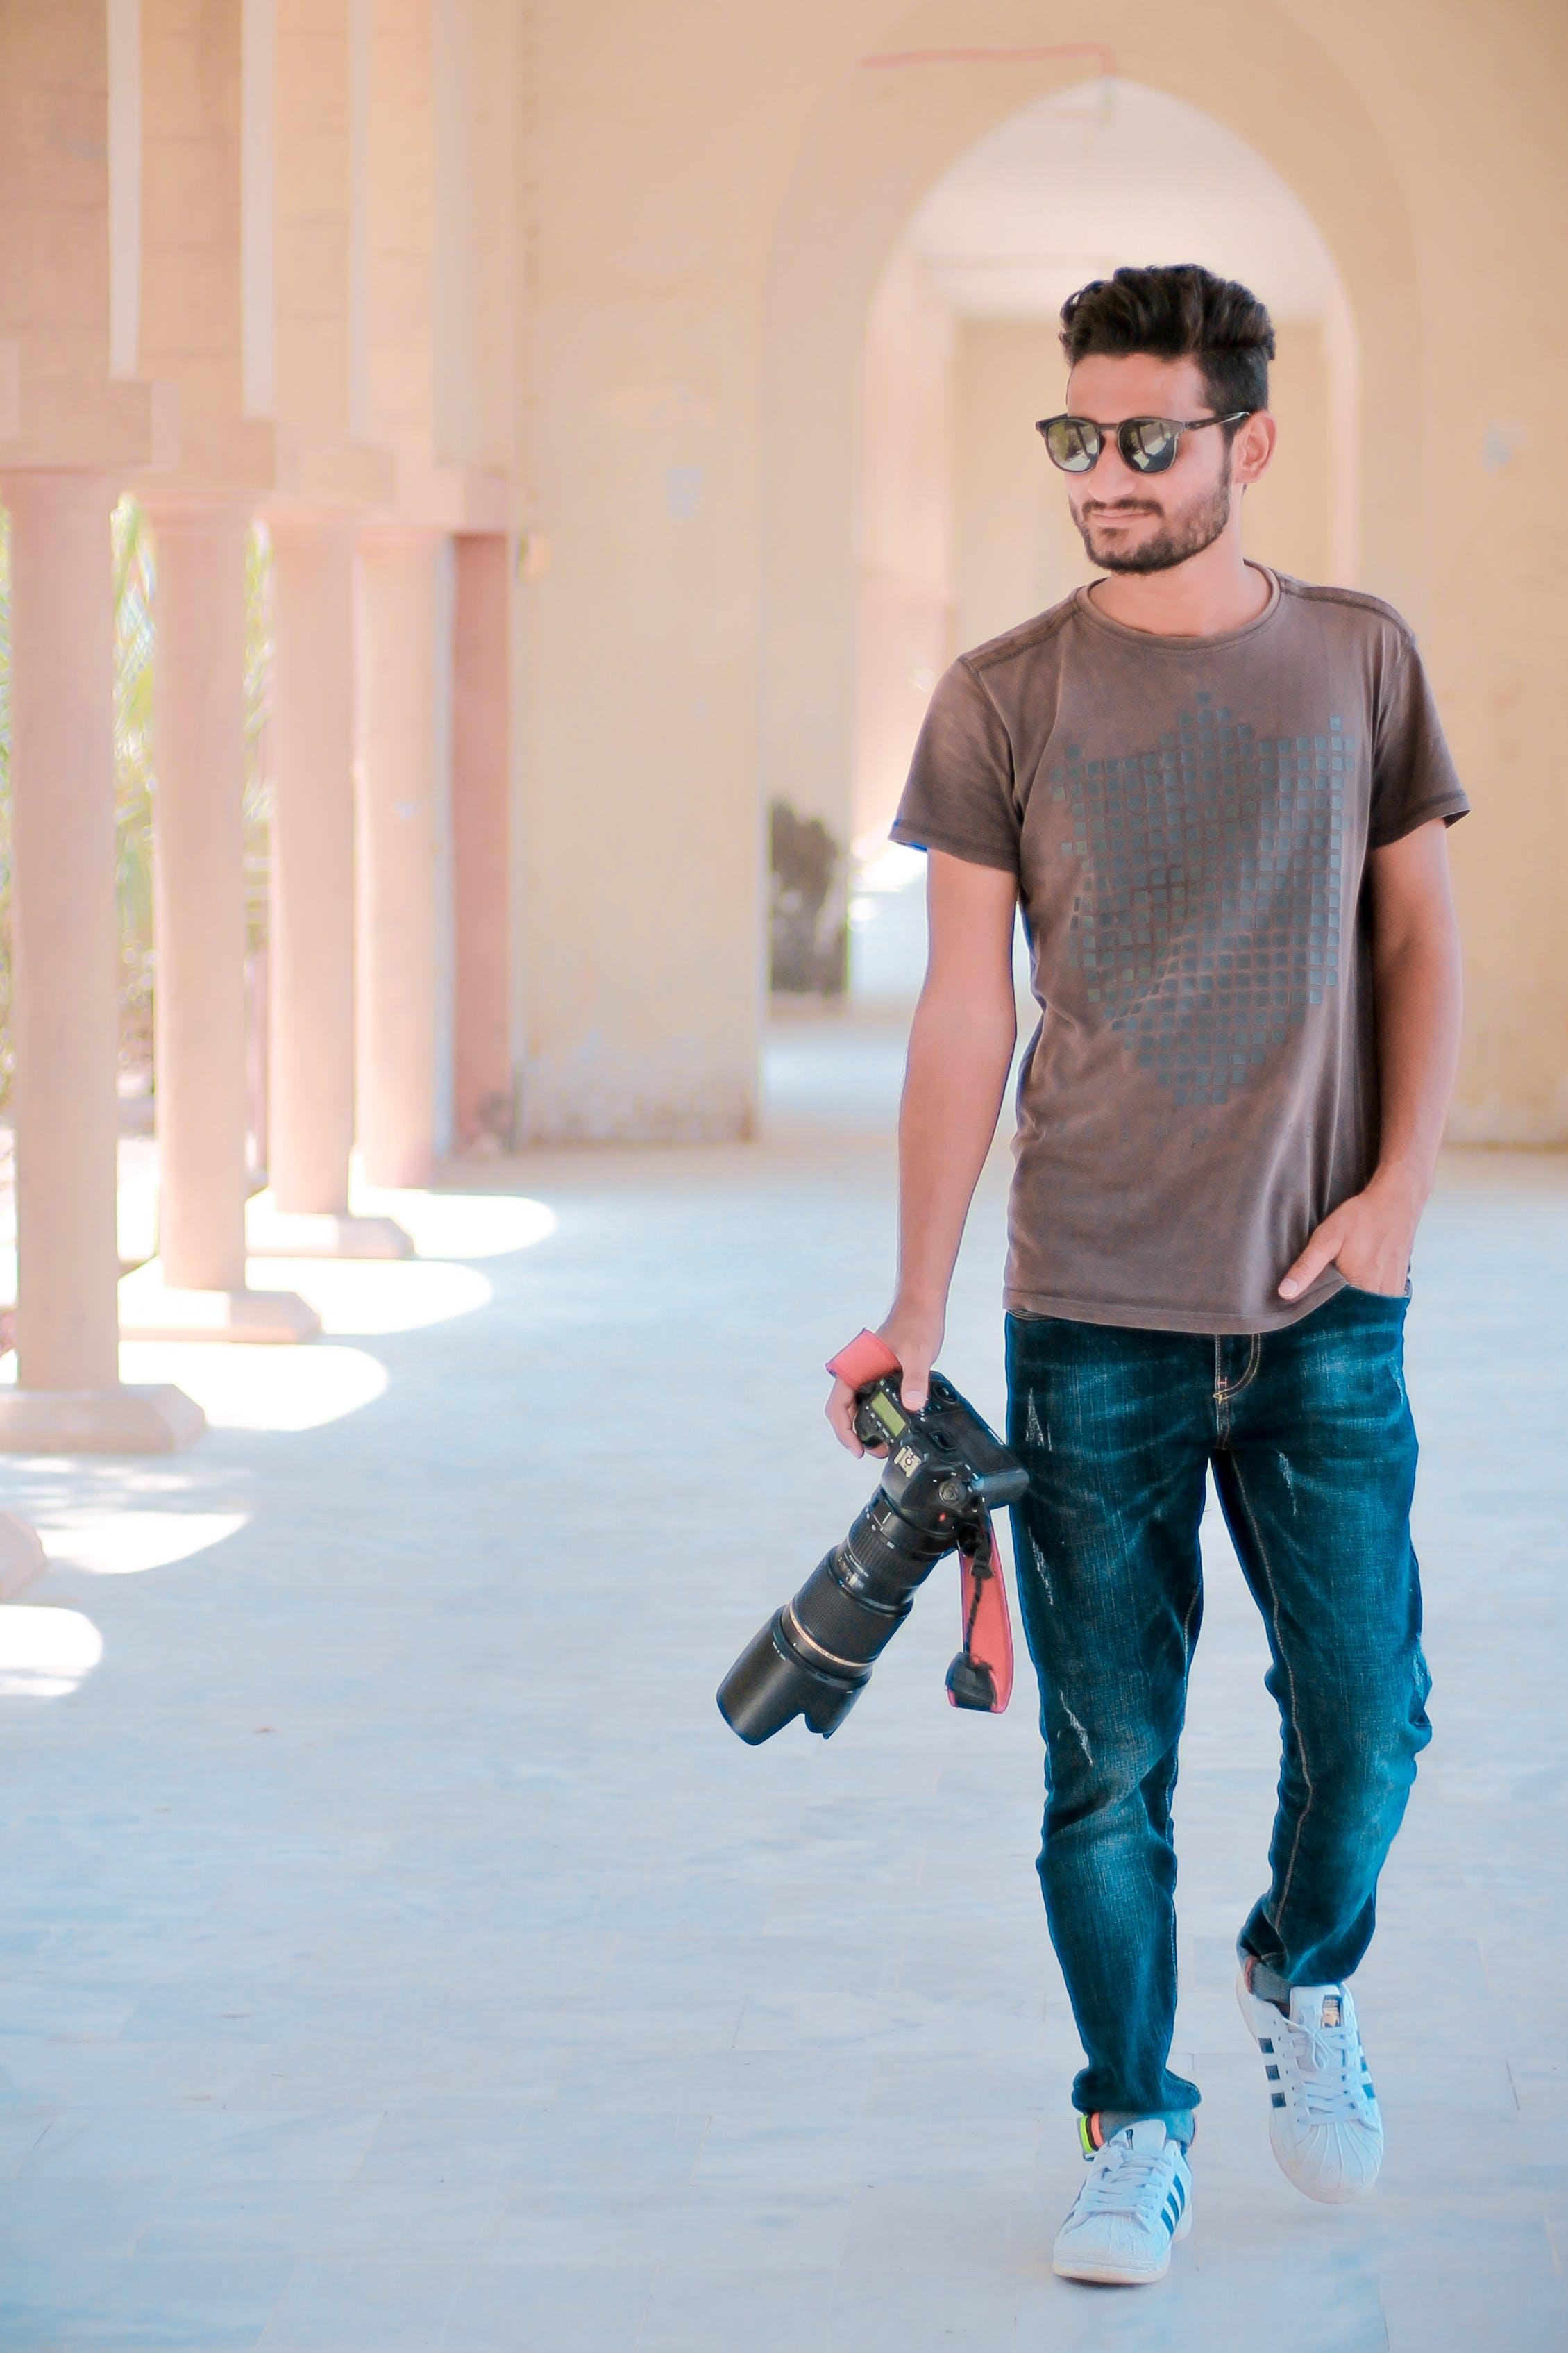 Man Walking On Hallway While Holding Dslr Camera